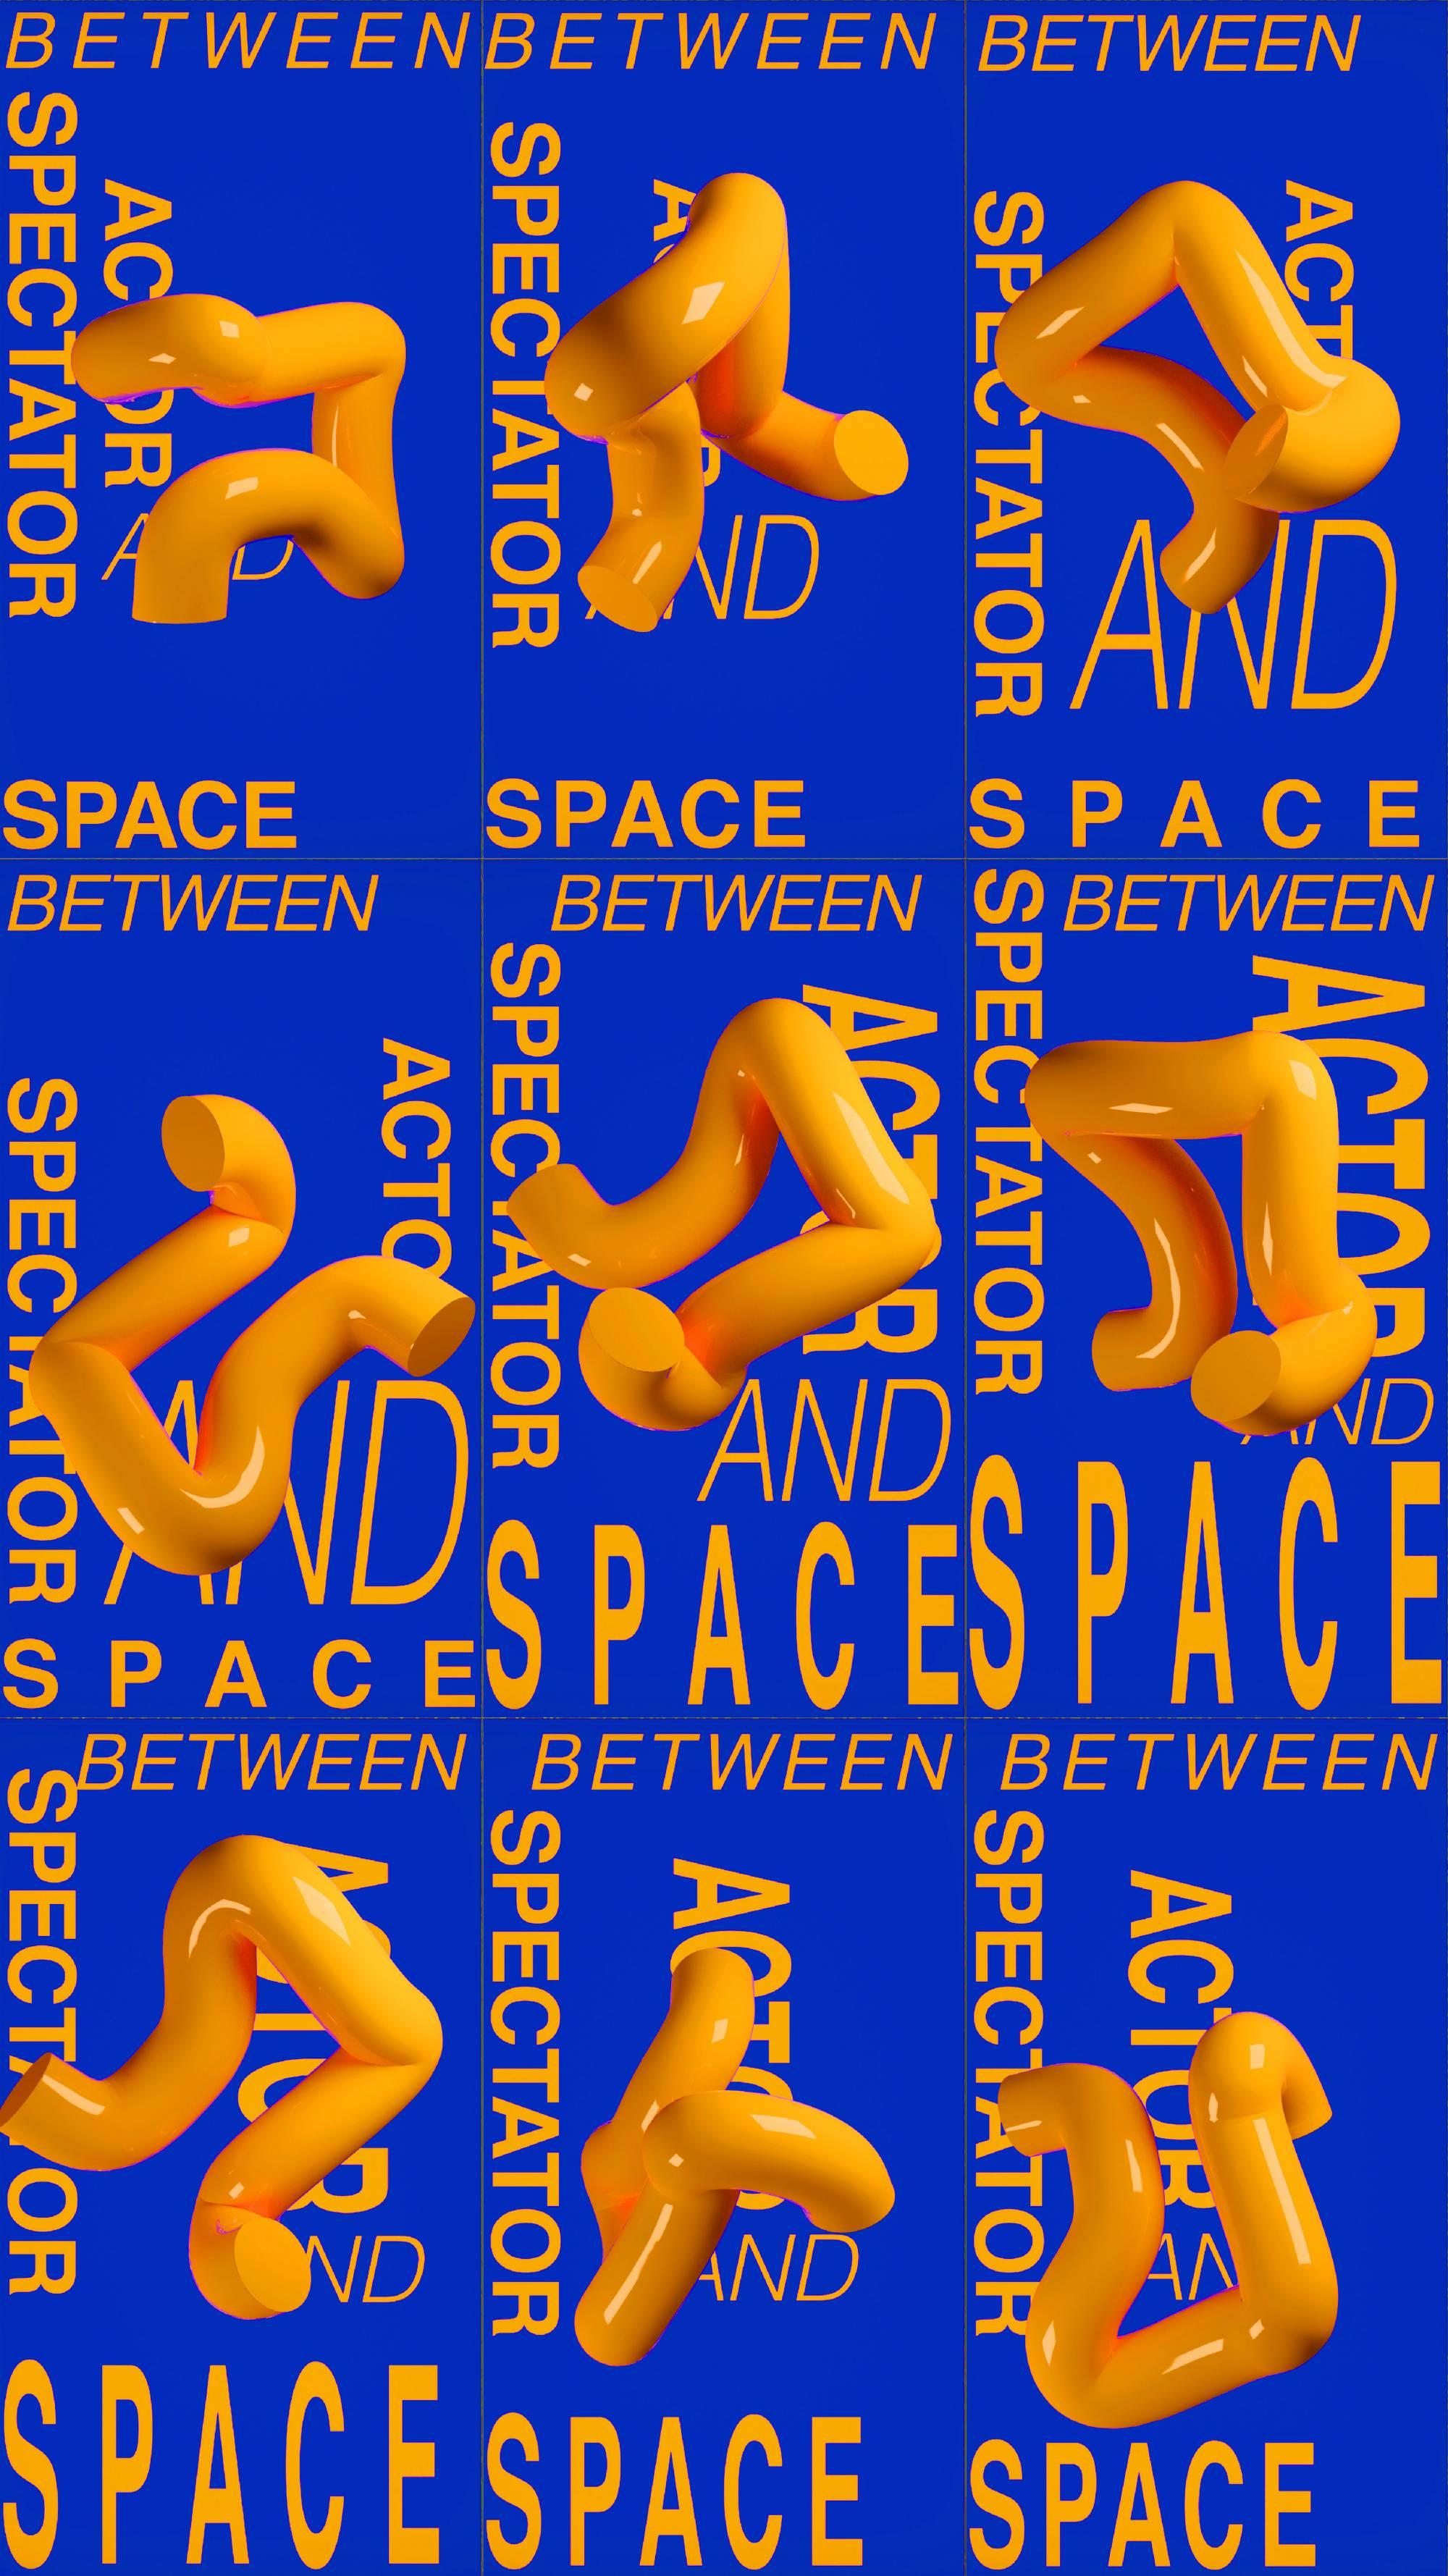 Between Spectator, Actor and Space